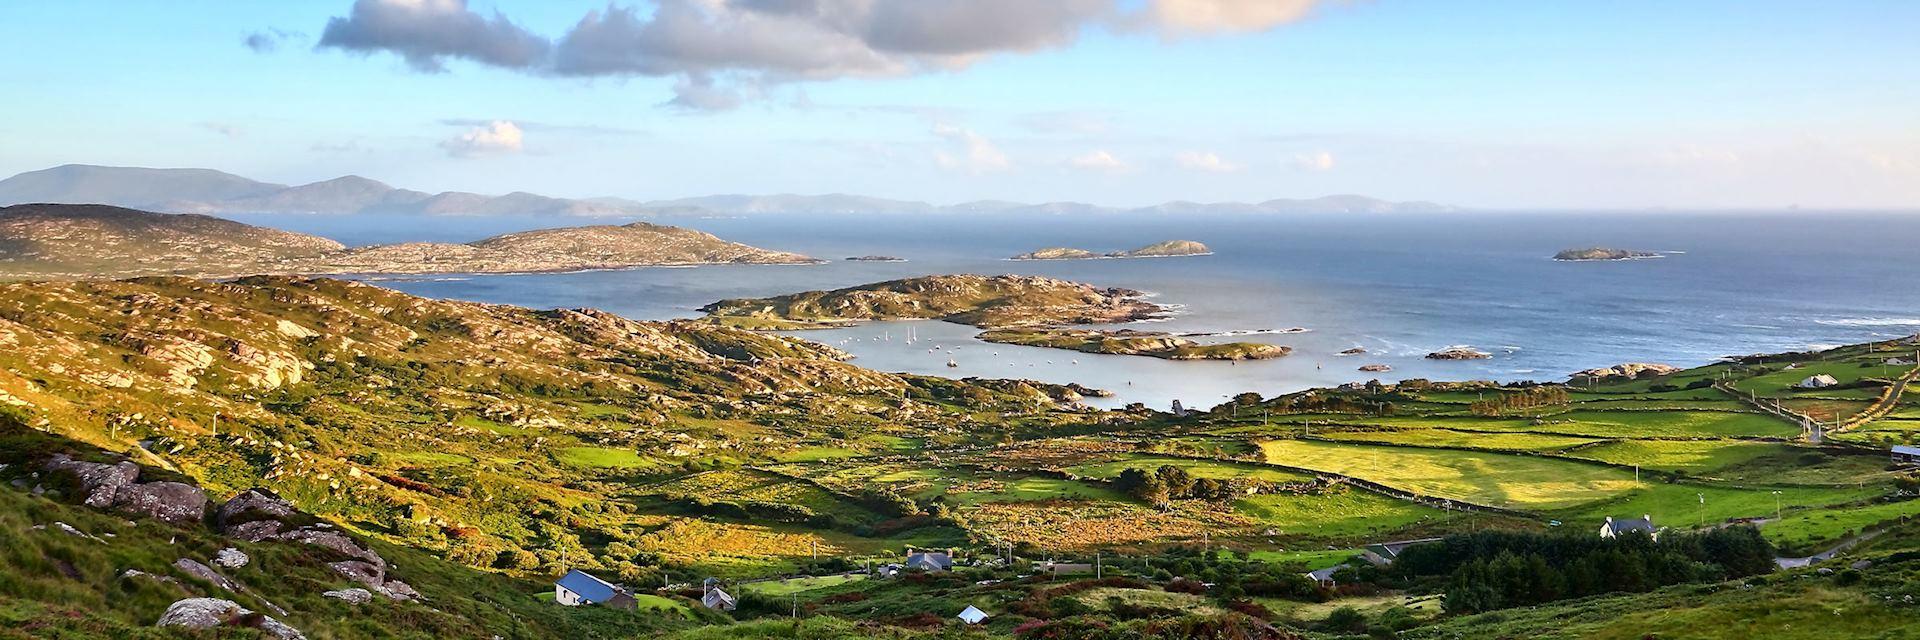 Ring of Kerry coastline, Ireland